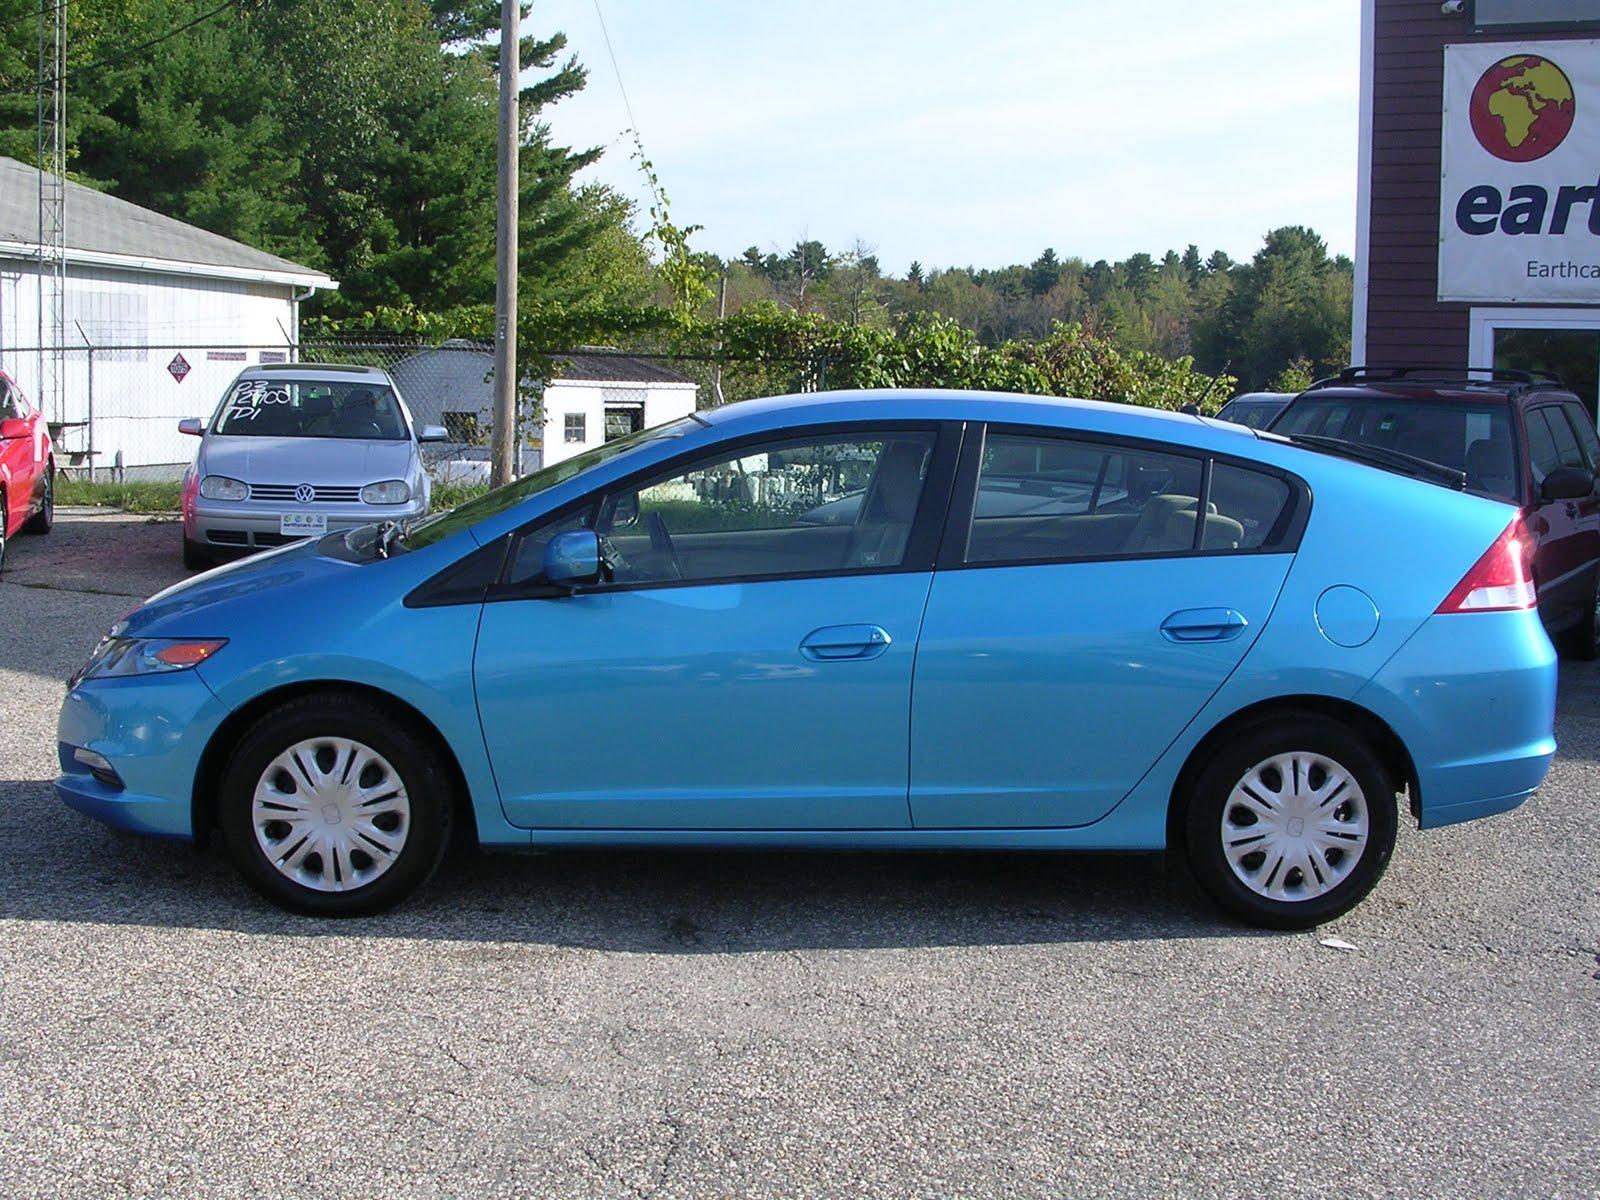 Earthy Cars Blog: EARTHY CAR OF THE WEEK: 2010 Blue Honda ...